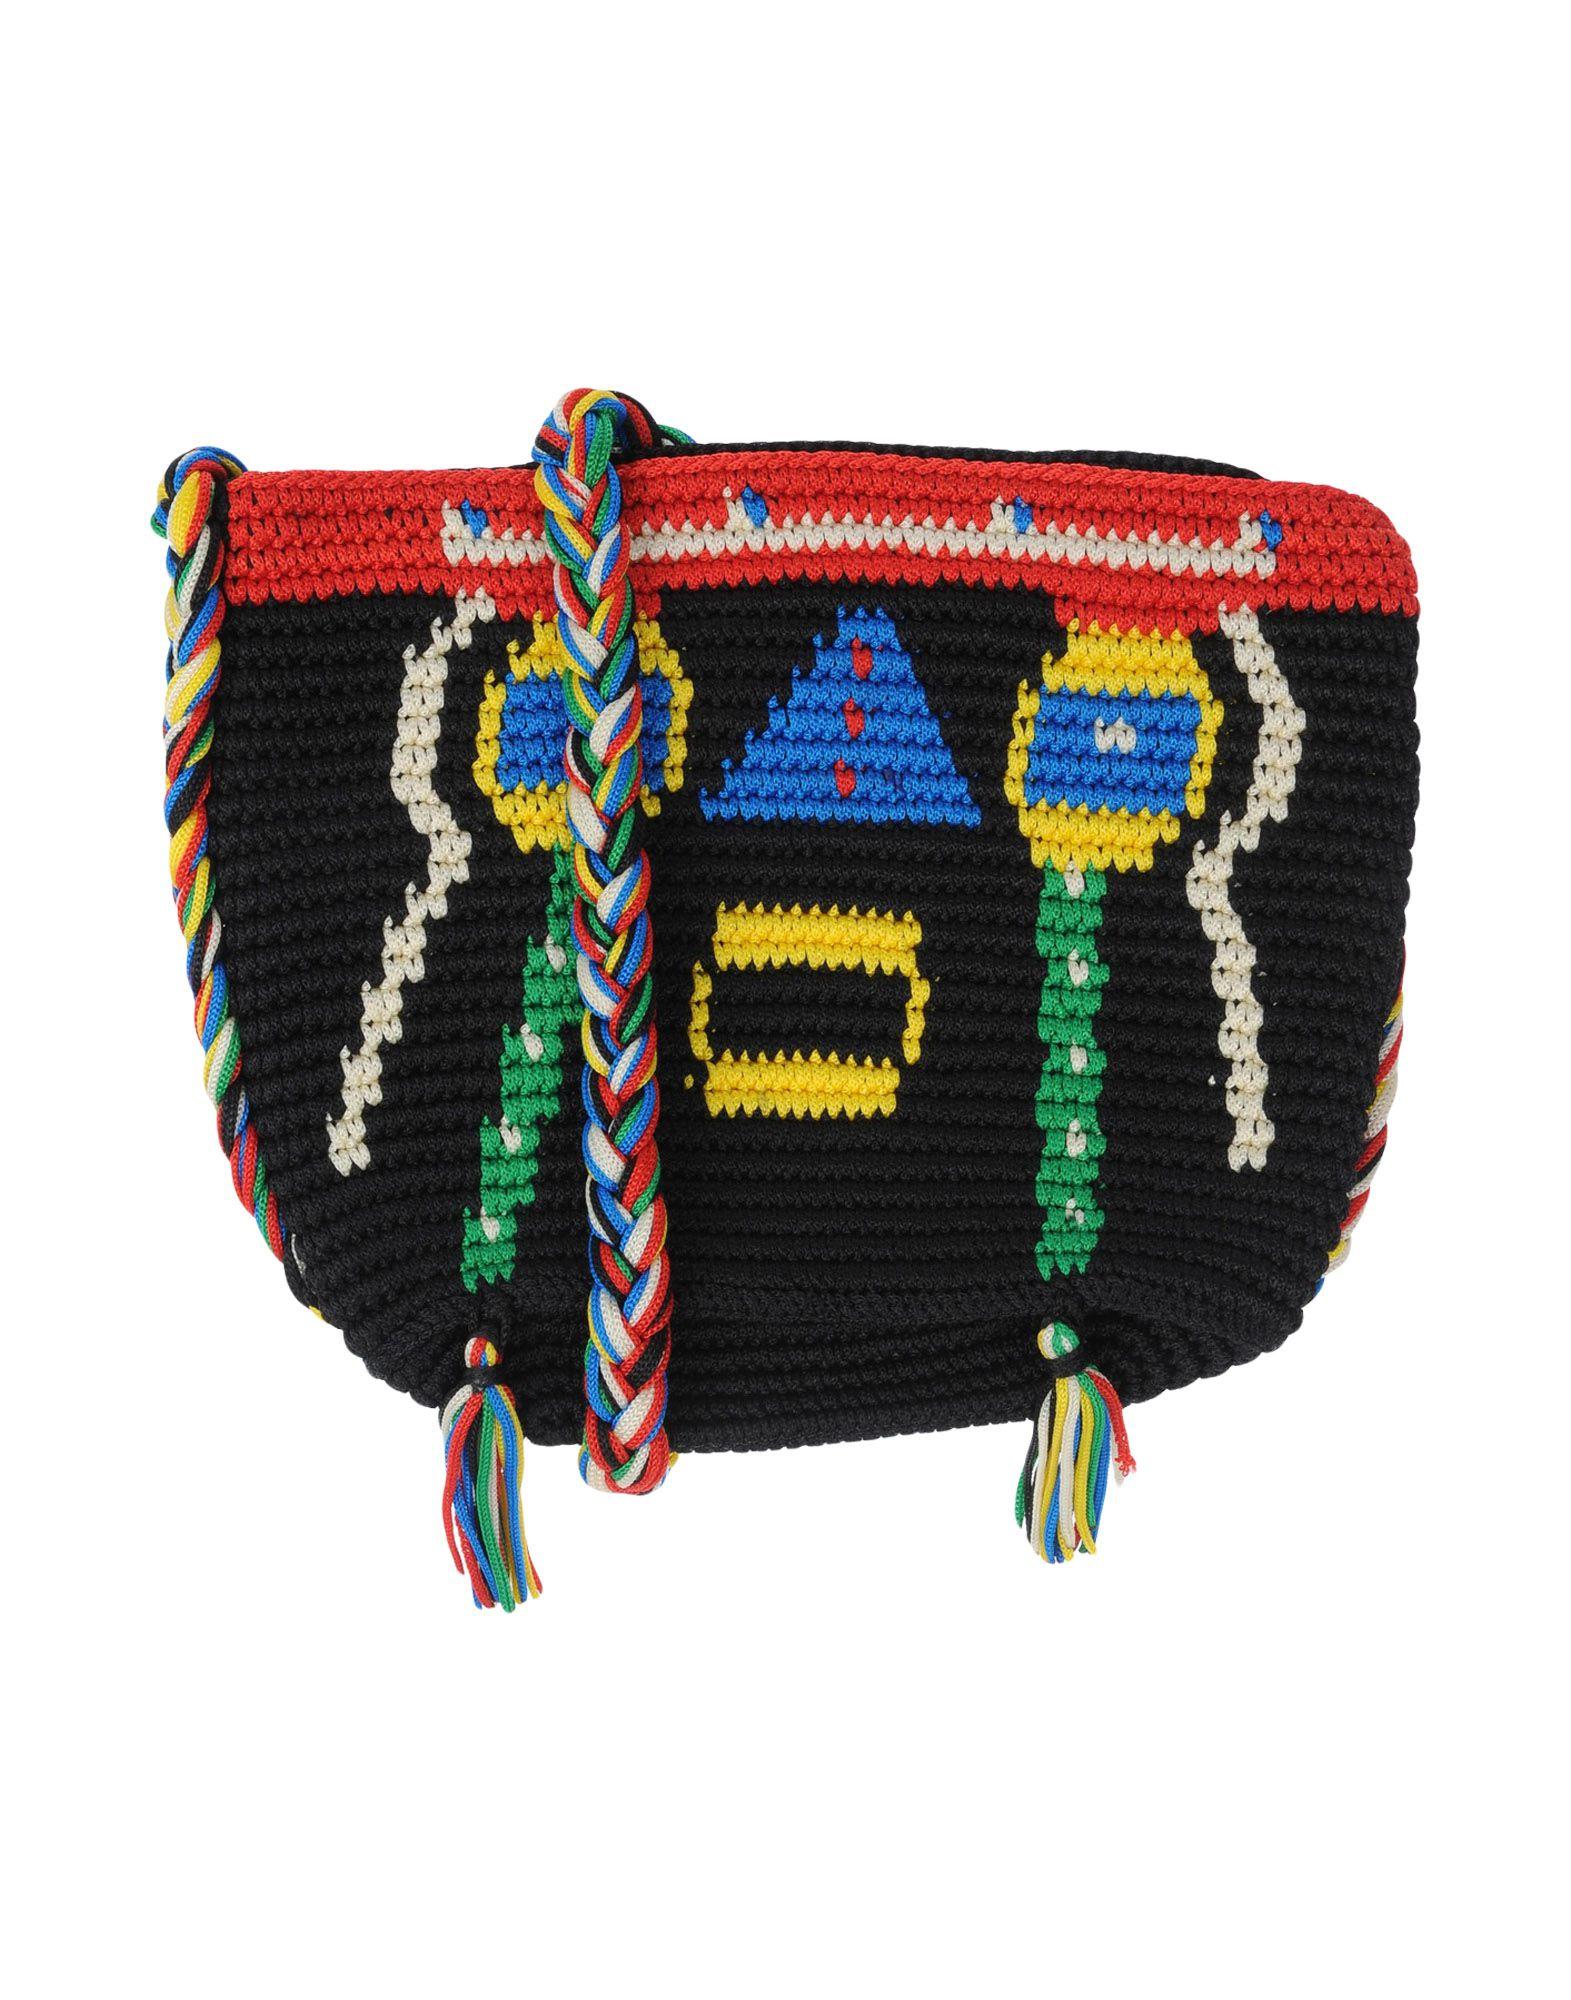 SENSI STUDIO Сумка через плечо сумка через плечо anais gvani croco ag 1471 350161